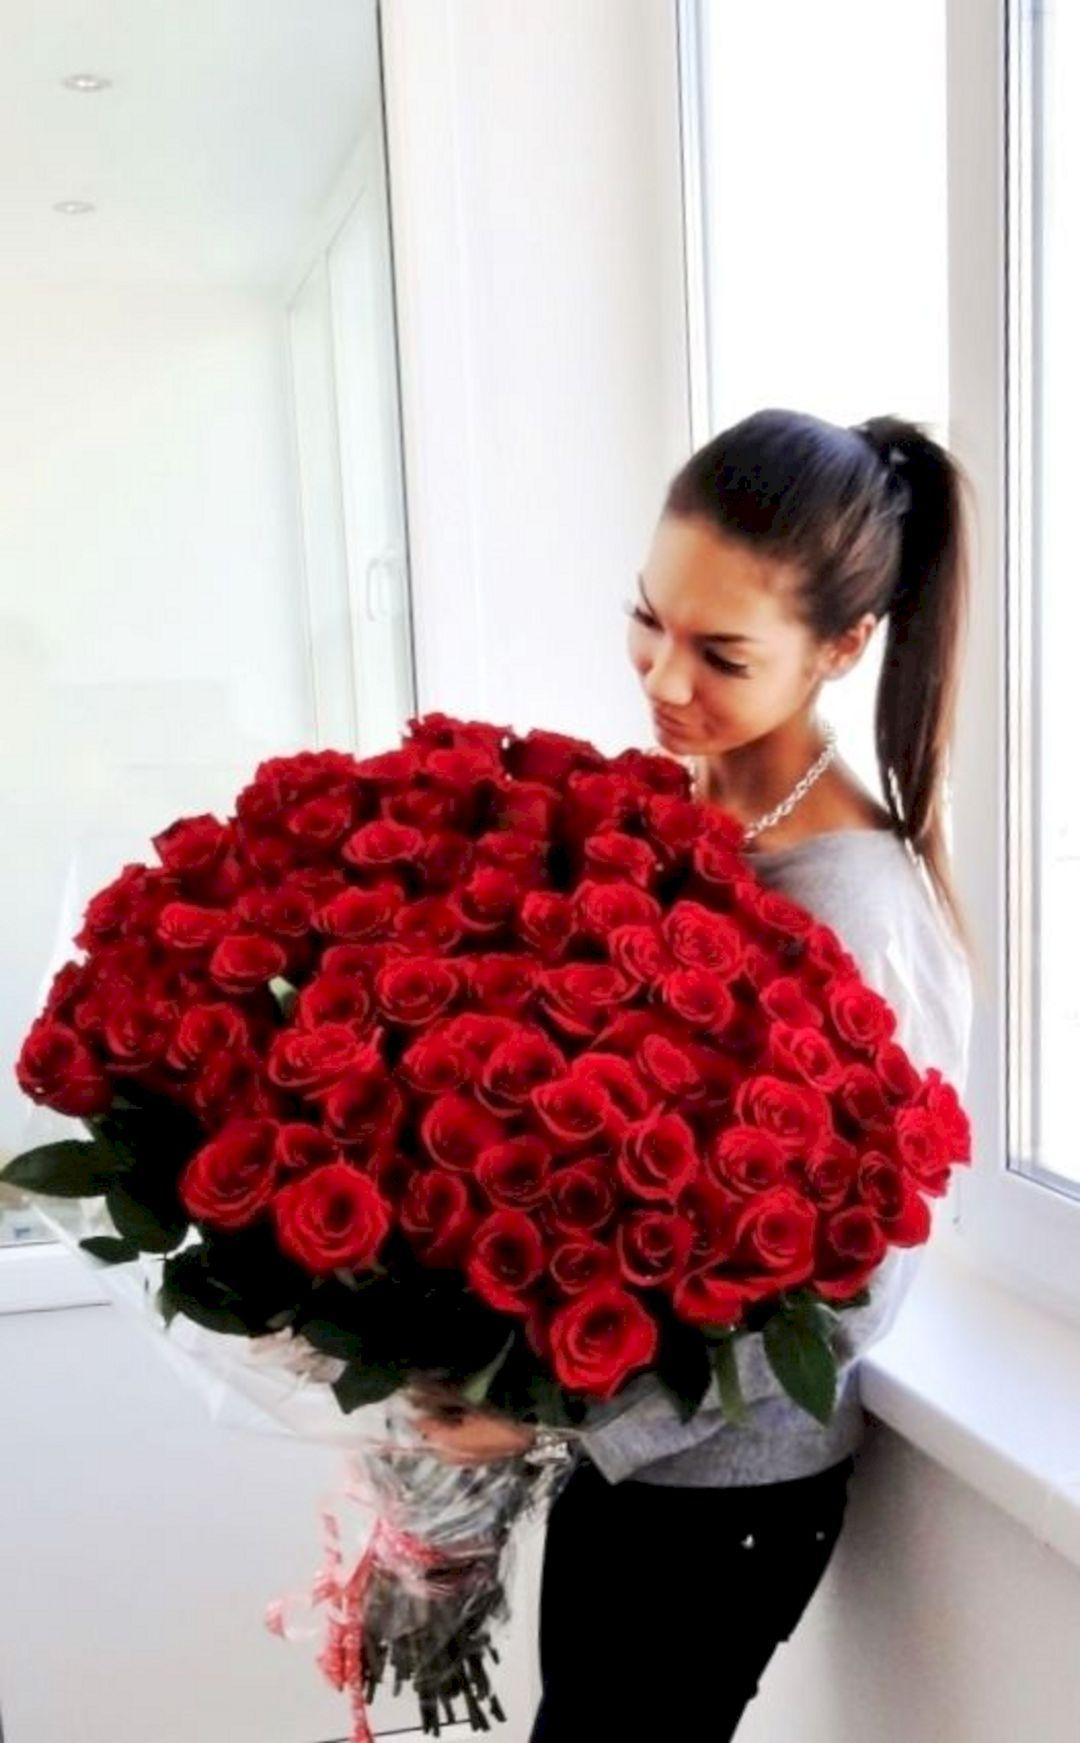 24 beautiful flowers arrangements ideas for valentine day impressive 24 beautiful flowers arrangements ideas for valentine day https24spaces izmirmasajfo